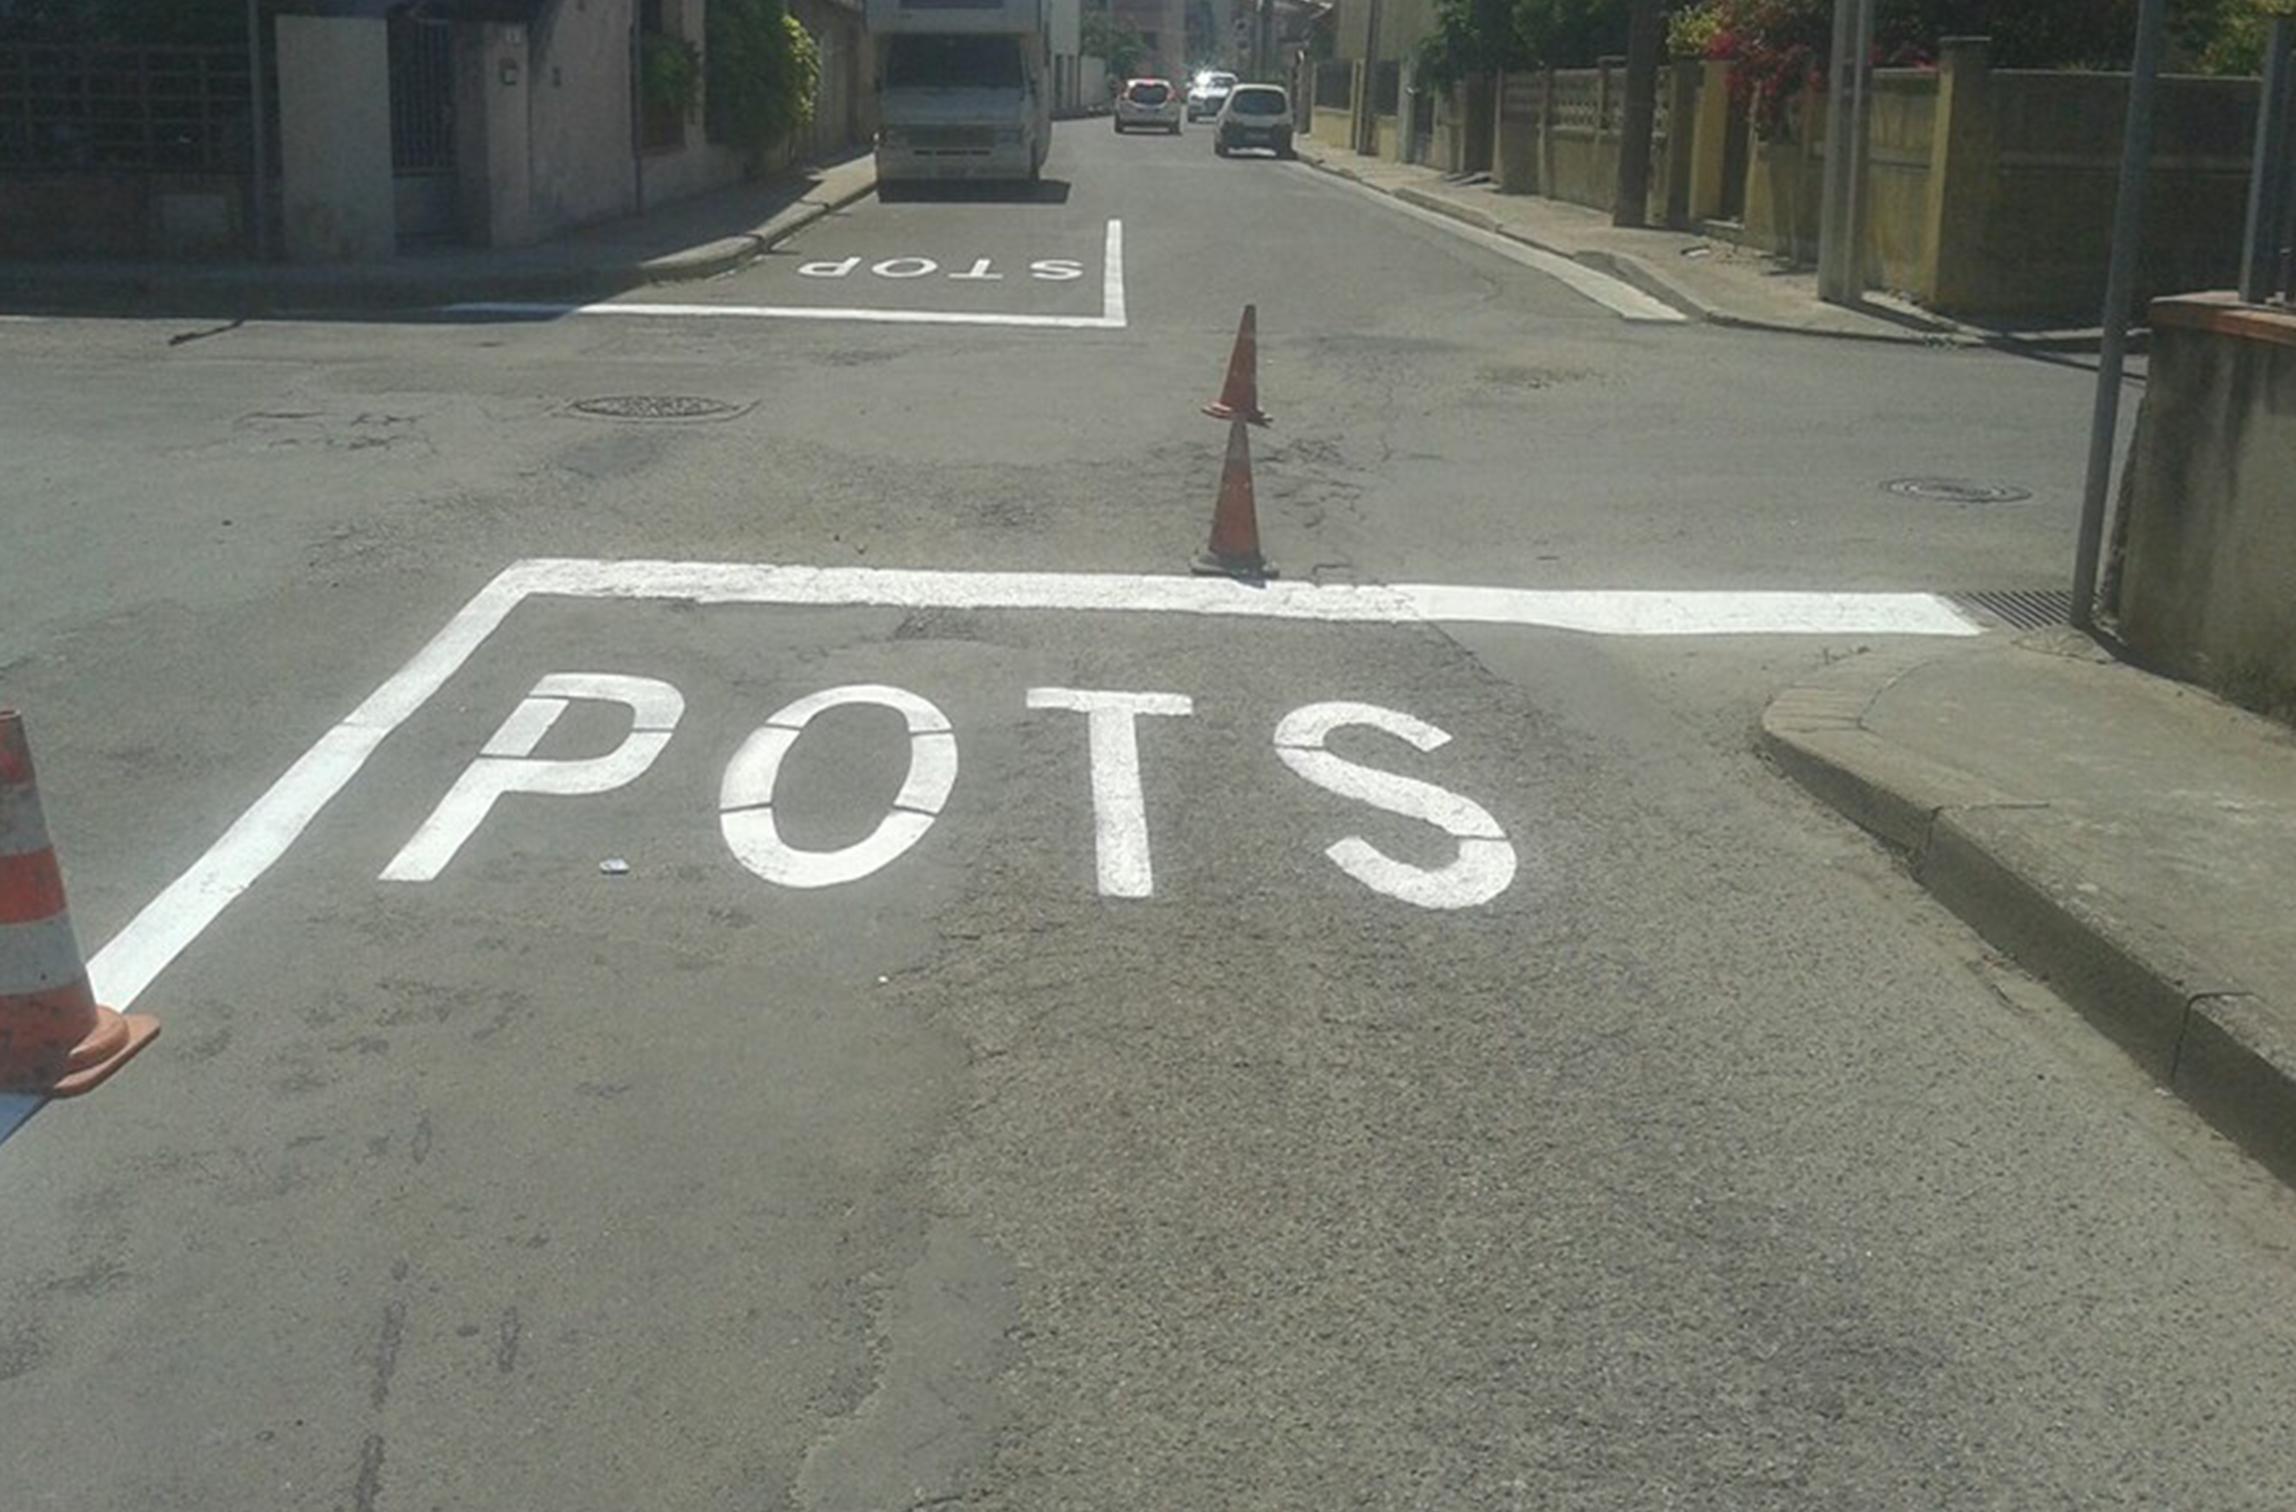 Curiosa segnaletica stradale a San Gavino